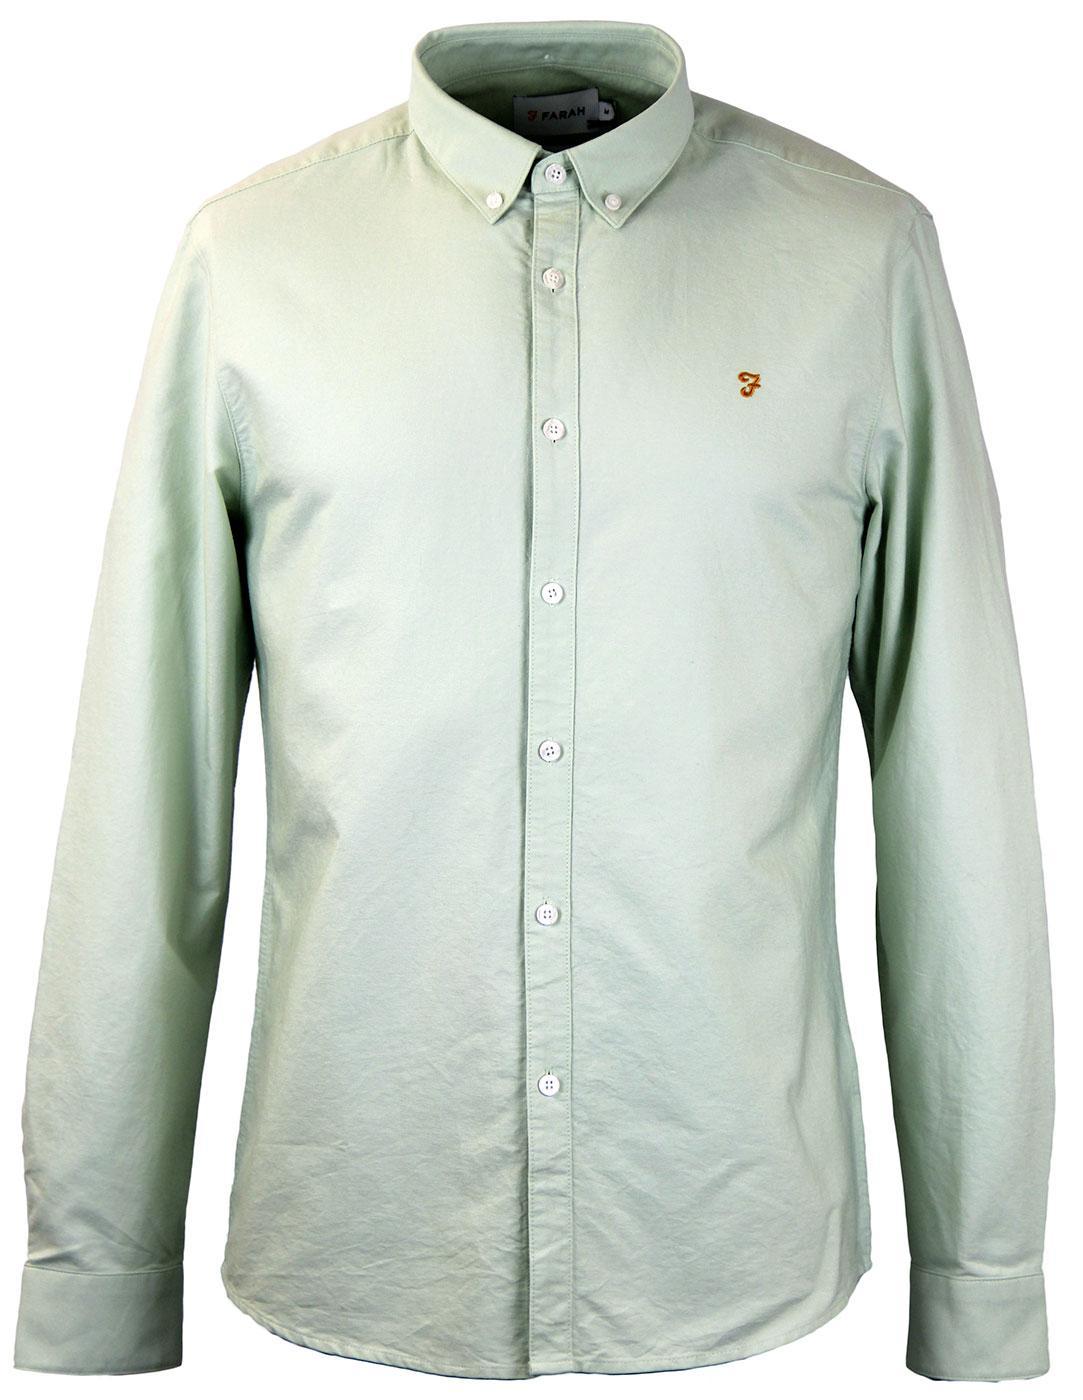 Brewer FARAH VINTAGE Retro 60s Mod Oxford Shirt SF